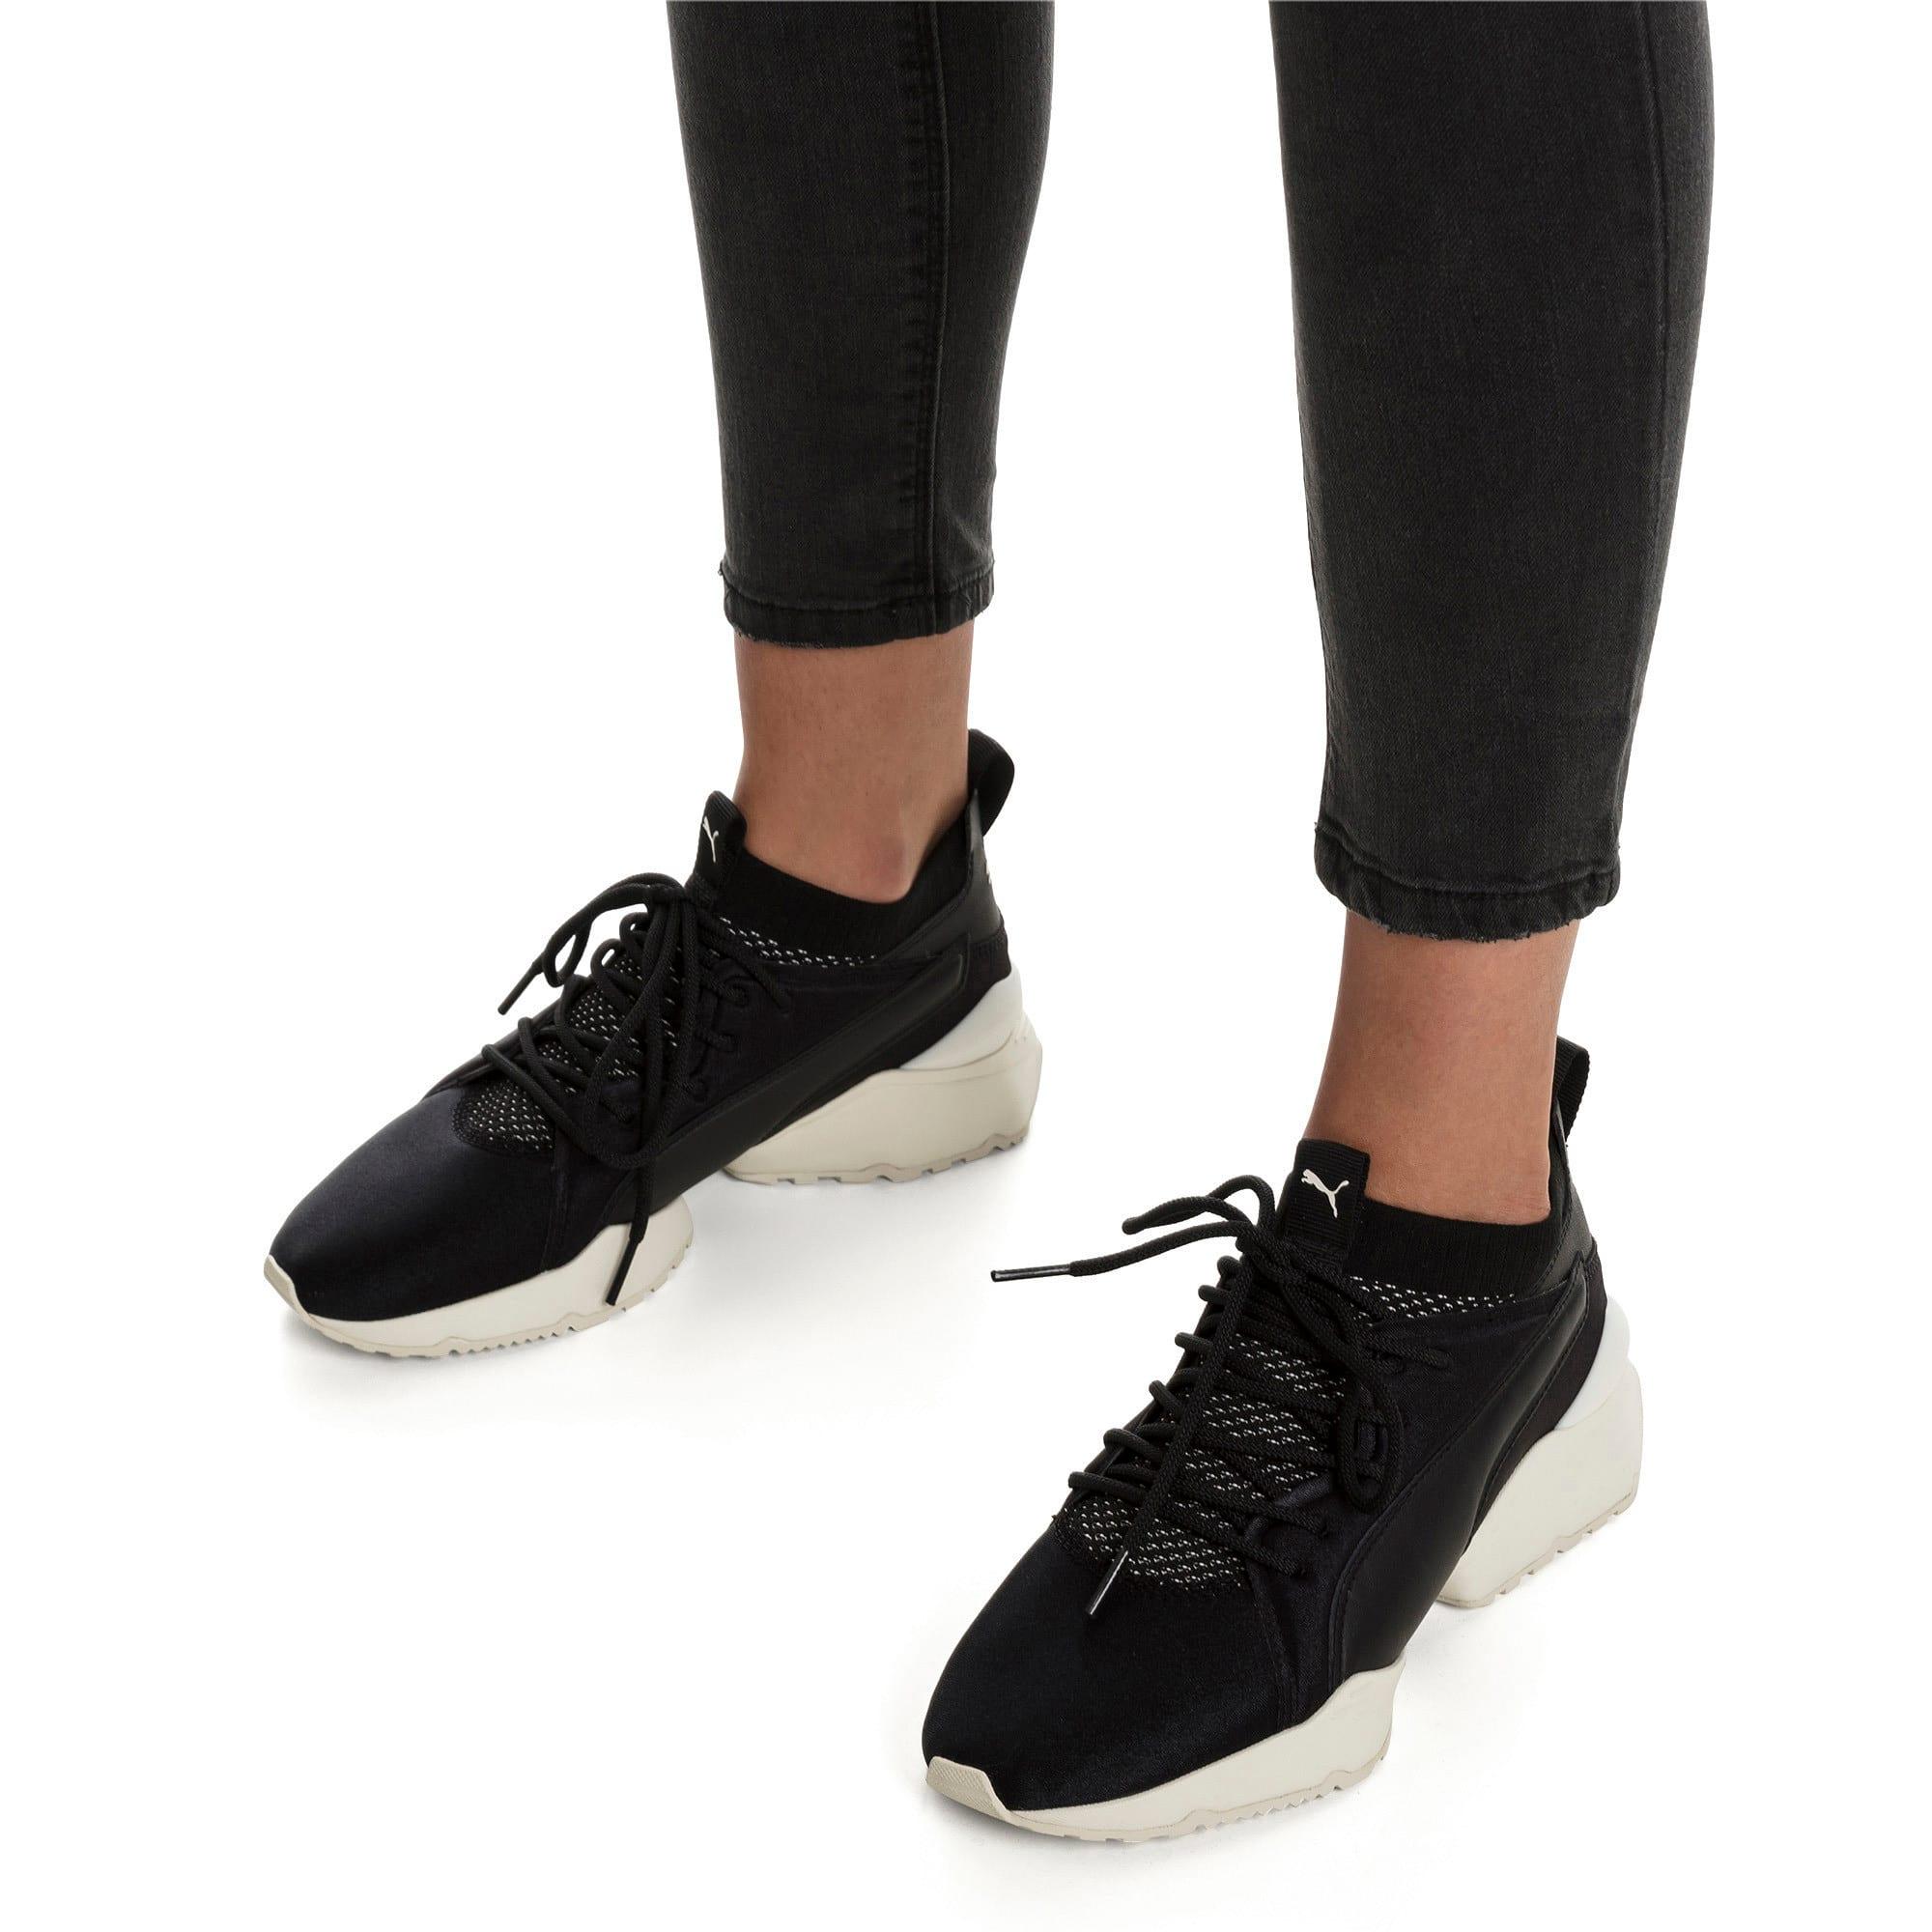 Thumbnail 2 of Muse Maia Knit Premium Women's Shoes, Puma Black-Whisper White, medium